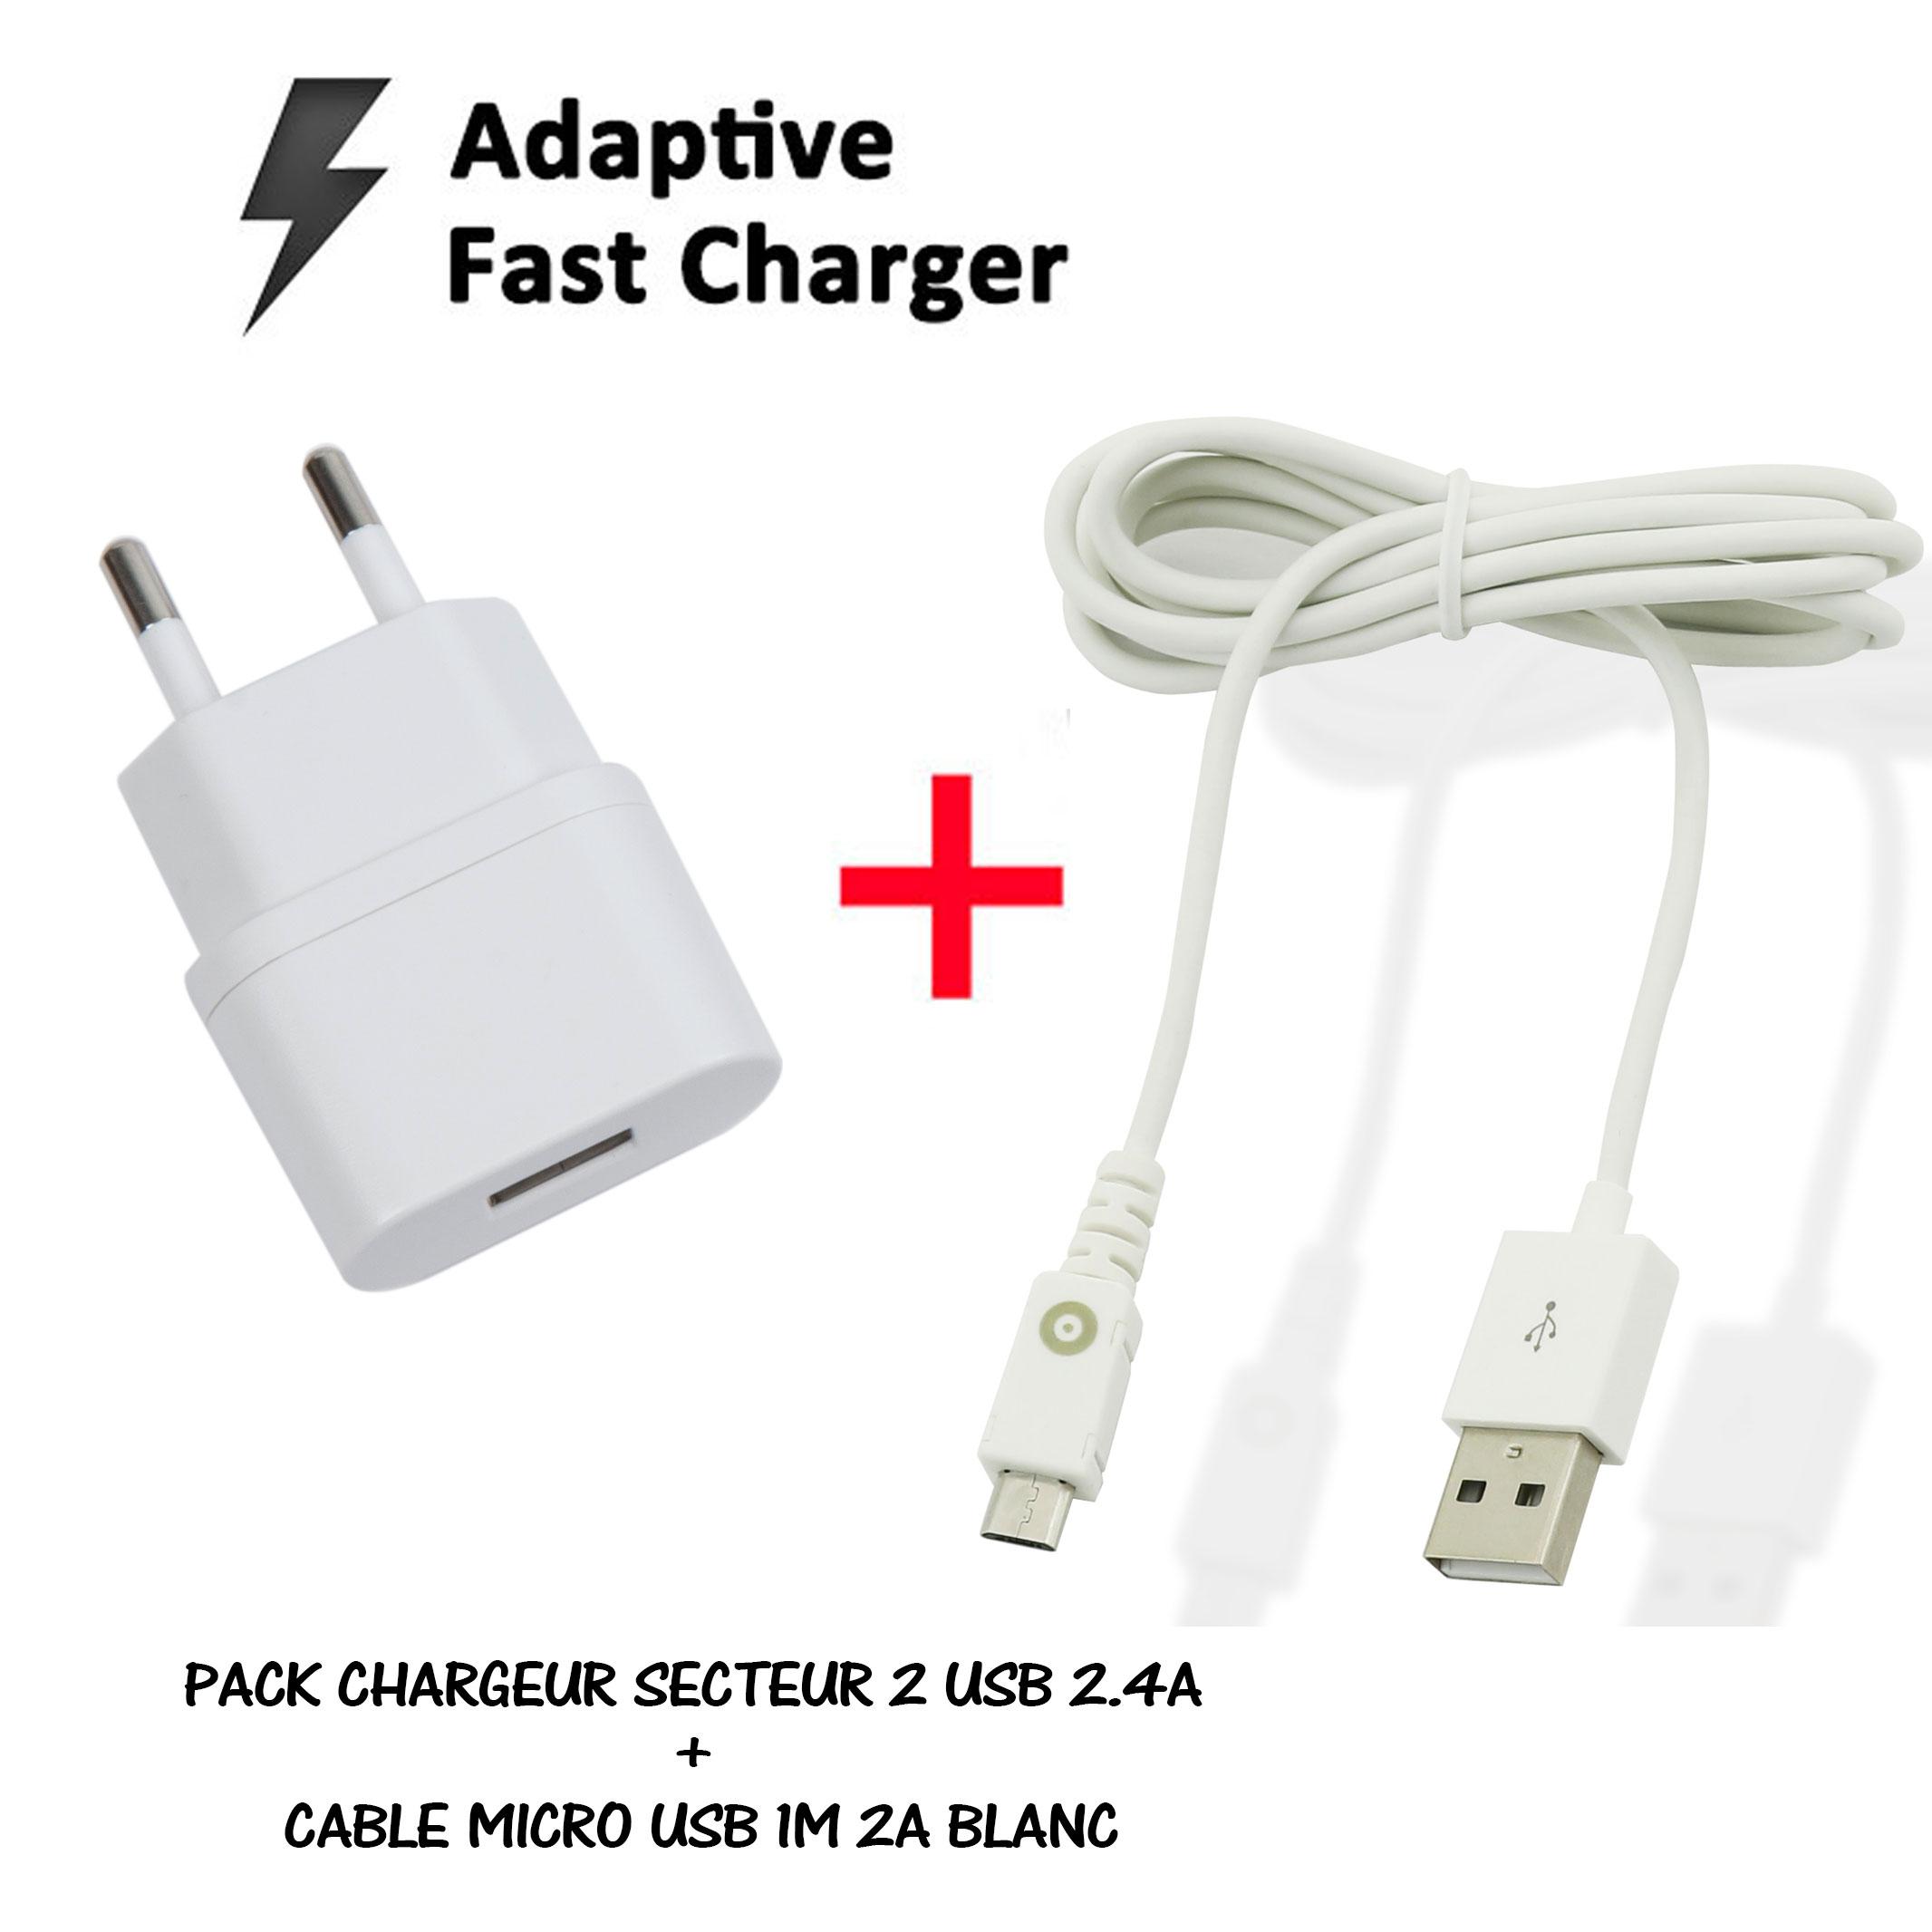 acheter  PACK CHARGEUR SECTEUR 2 USB 2.4A + CABLE MICRO USB 1M 2A BLANC